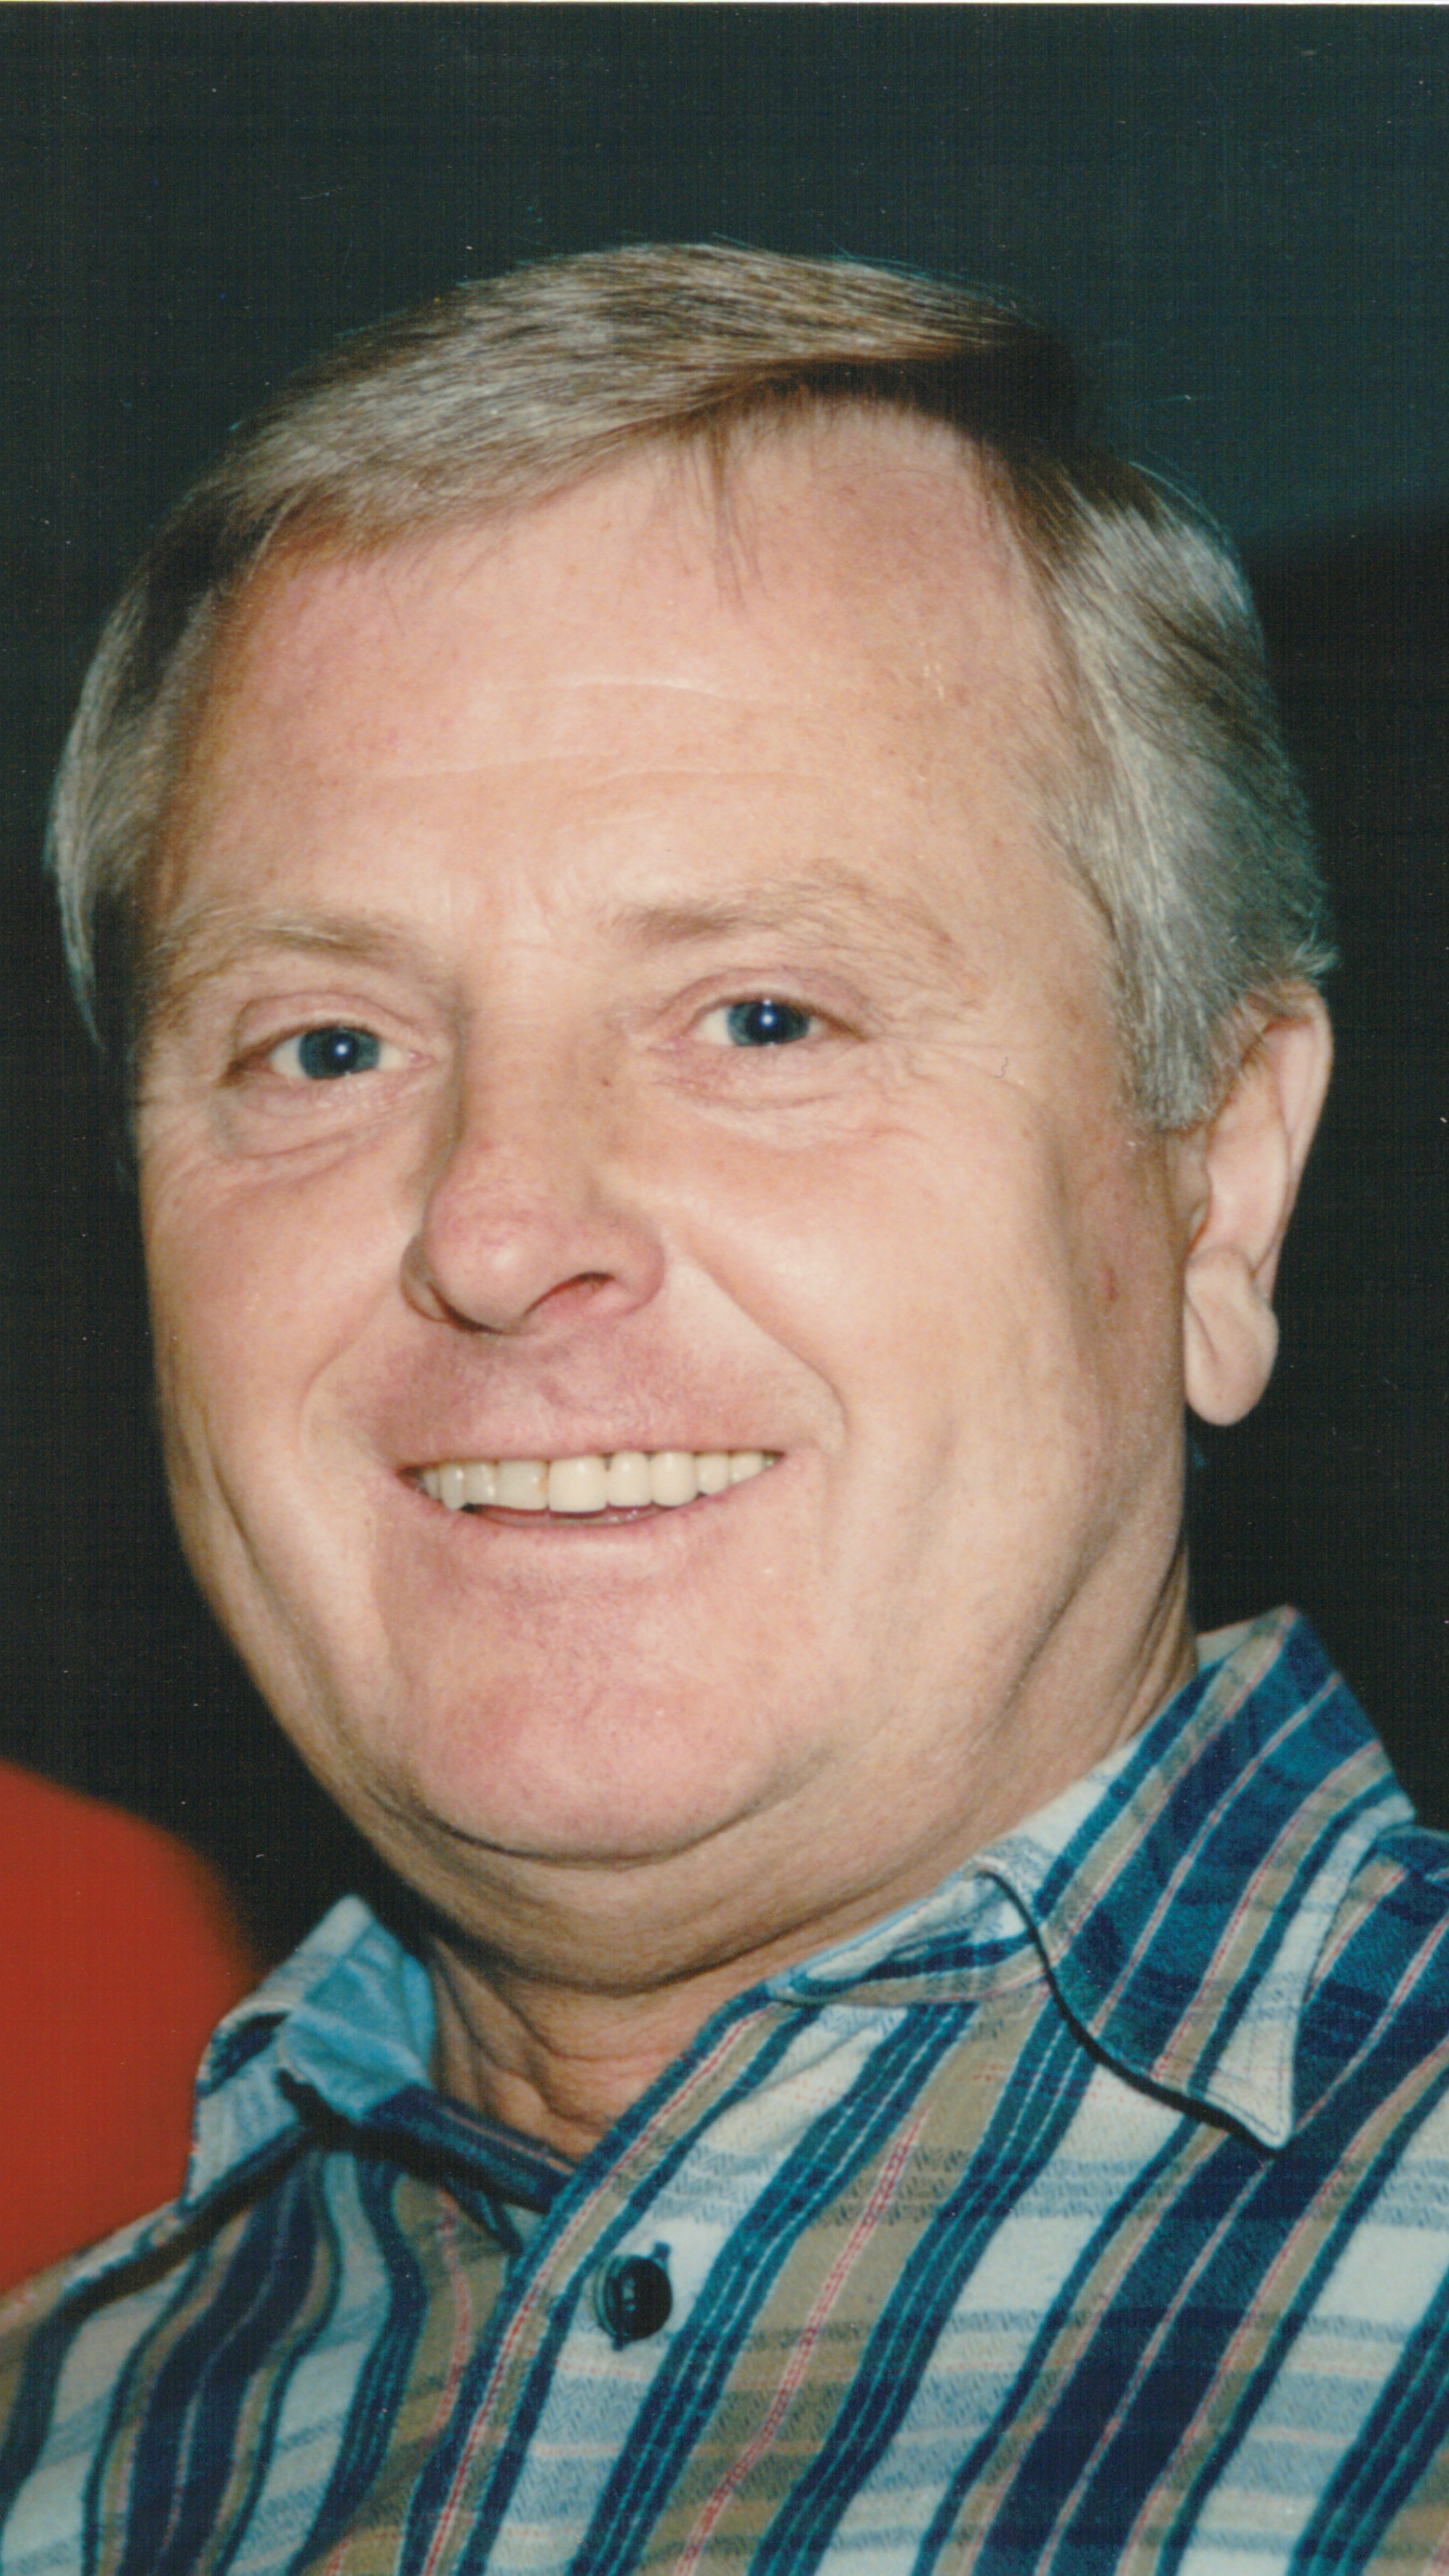 Siegfried Waschko